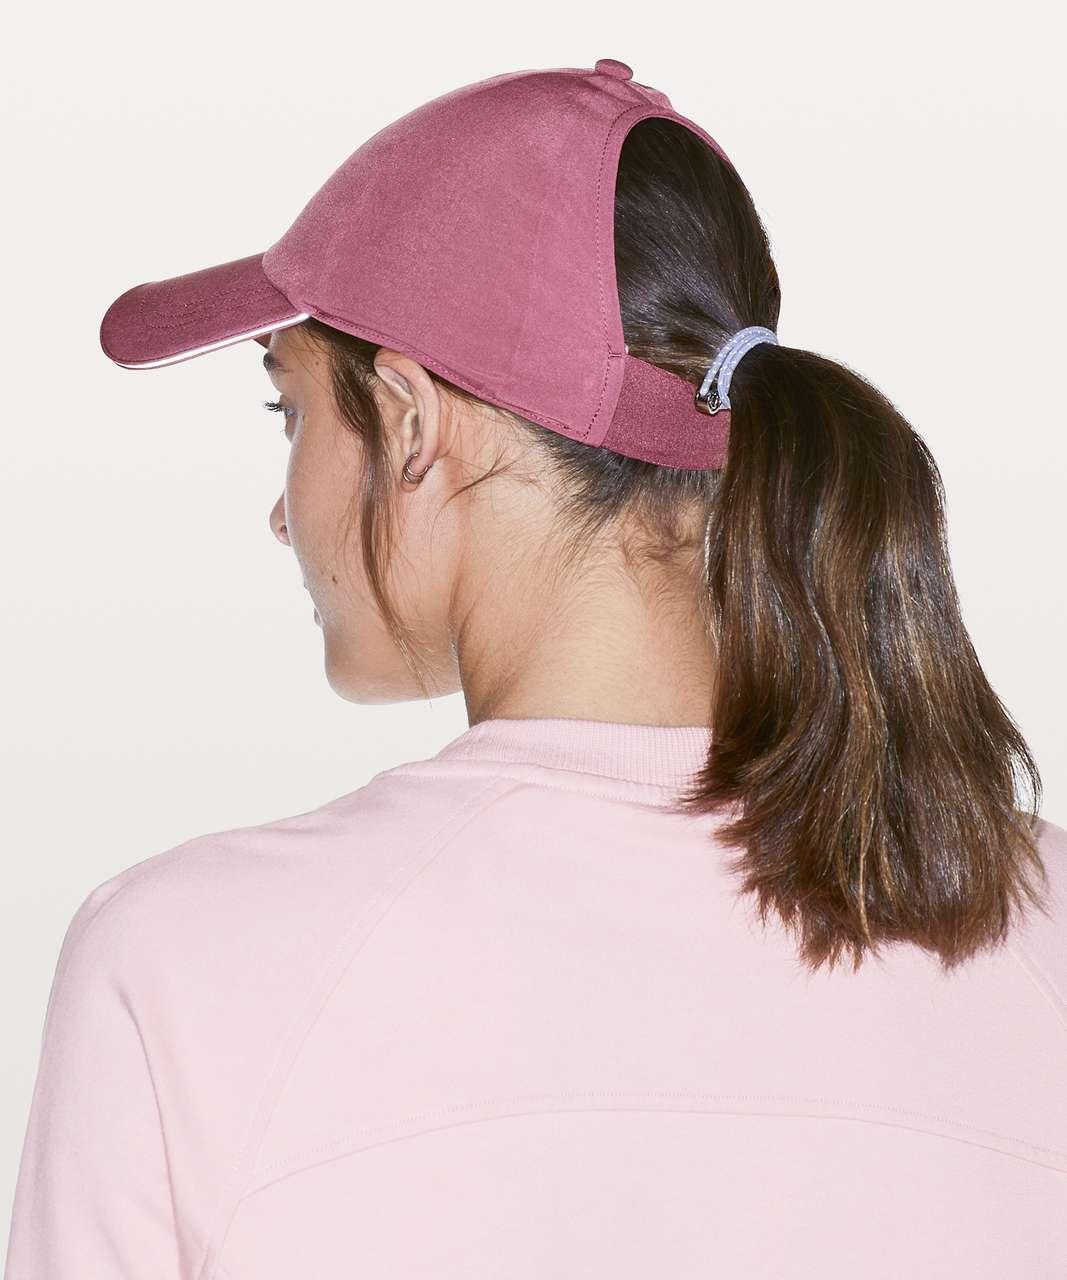 69ca4c18 Lululemon Baller Hat Run *Ponytail - Misty Merlot - lulu fanatics